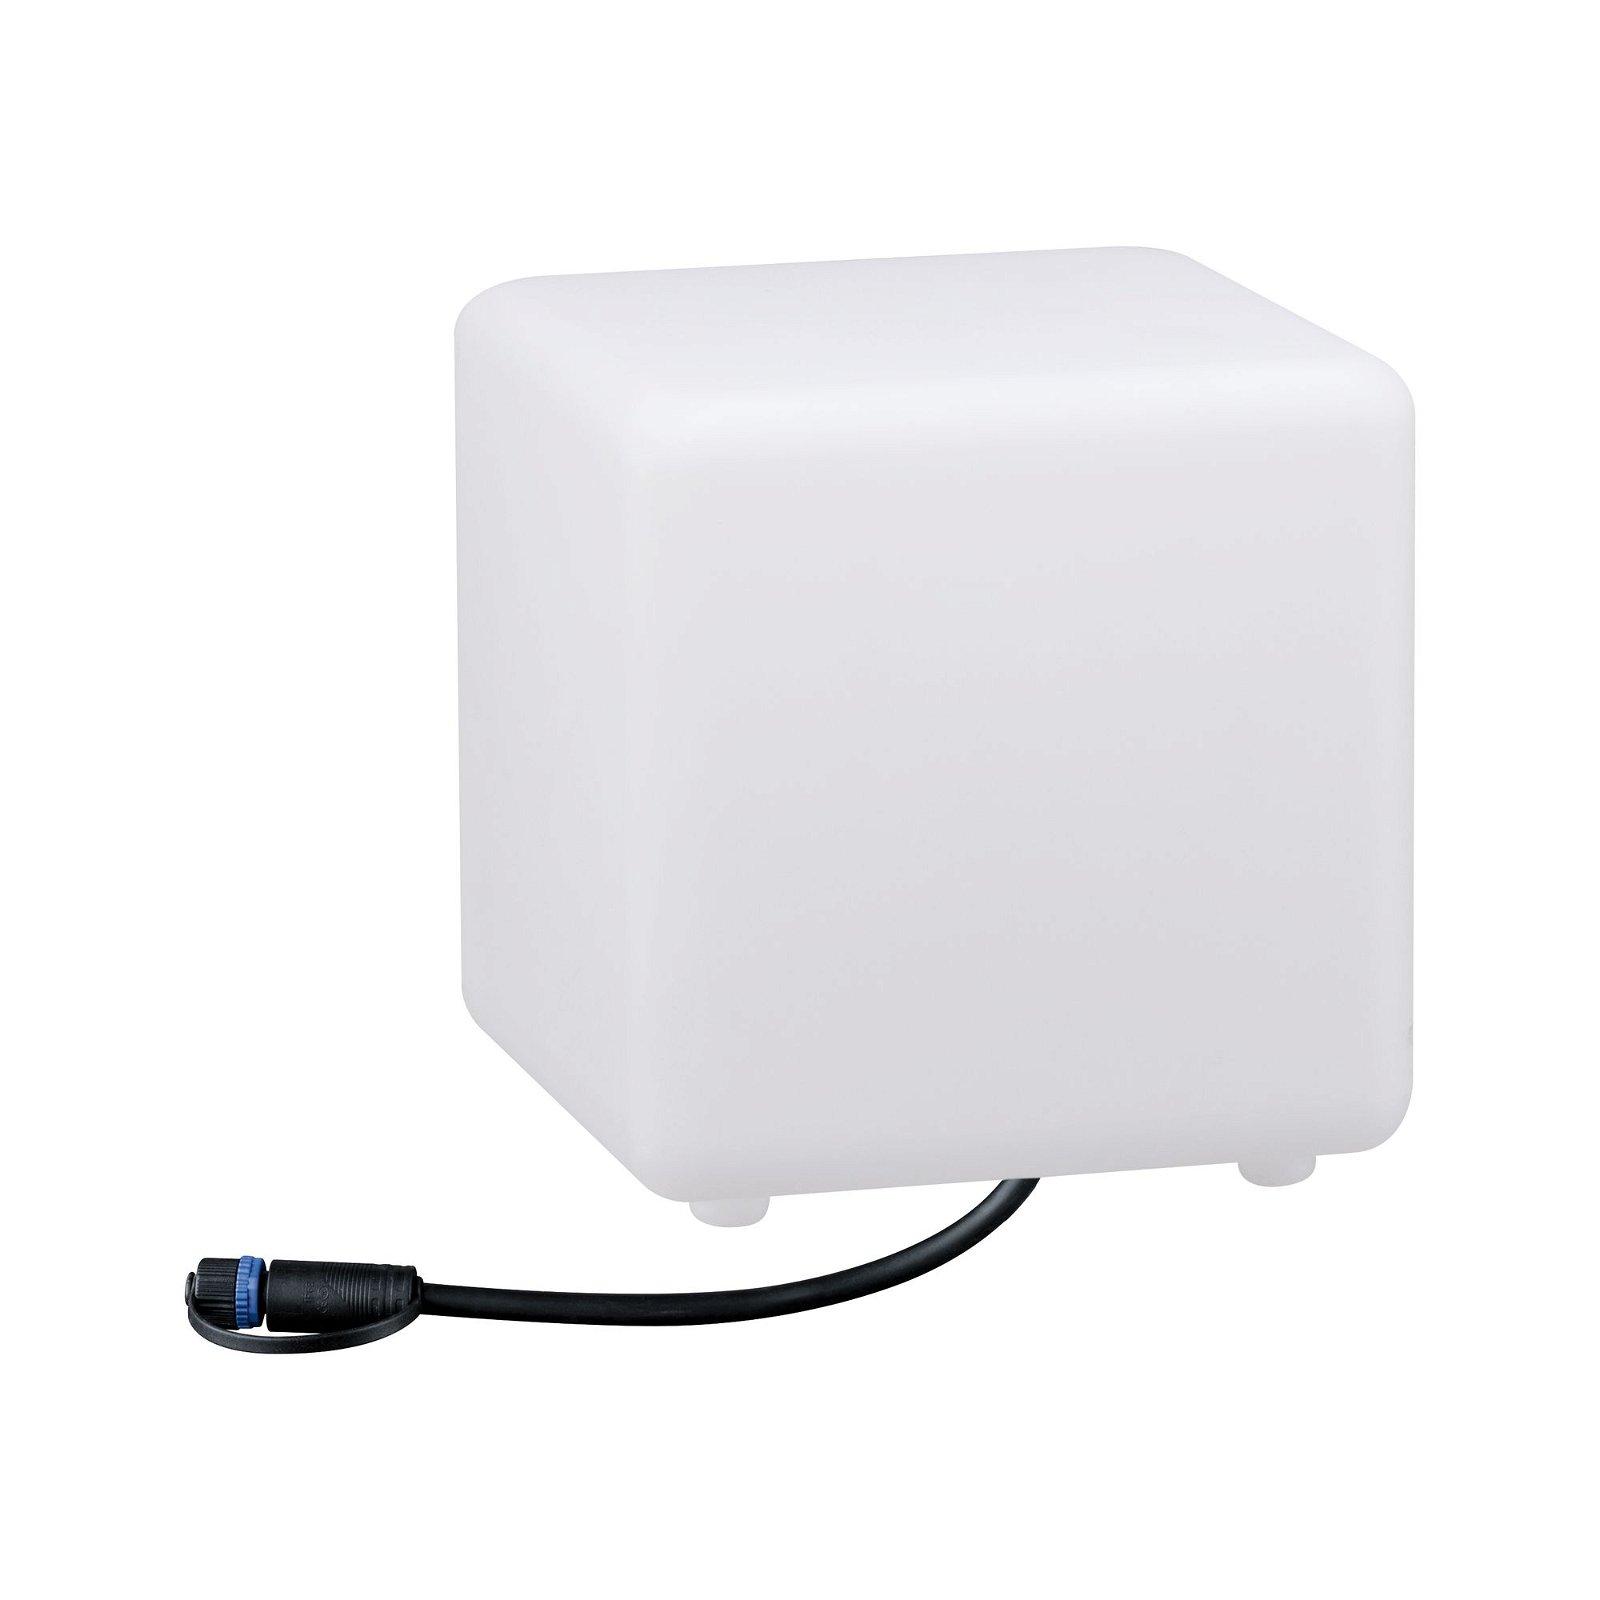 Plug & Shine Objet lumineux LED Smart Home Zigbee Cube IP65 RGBW 2,8W Blanc